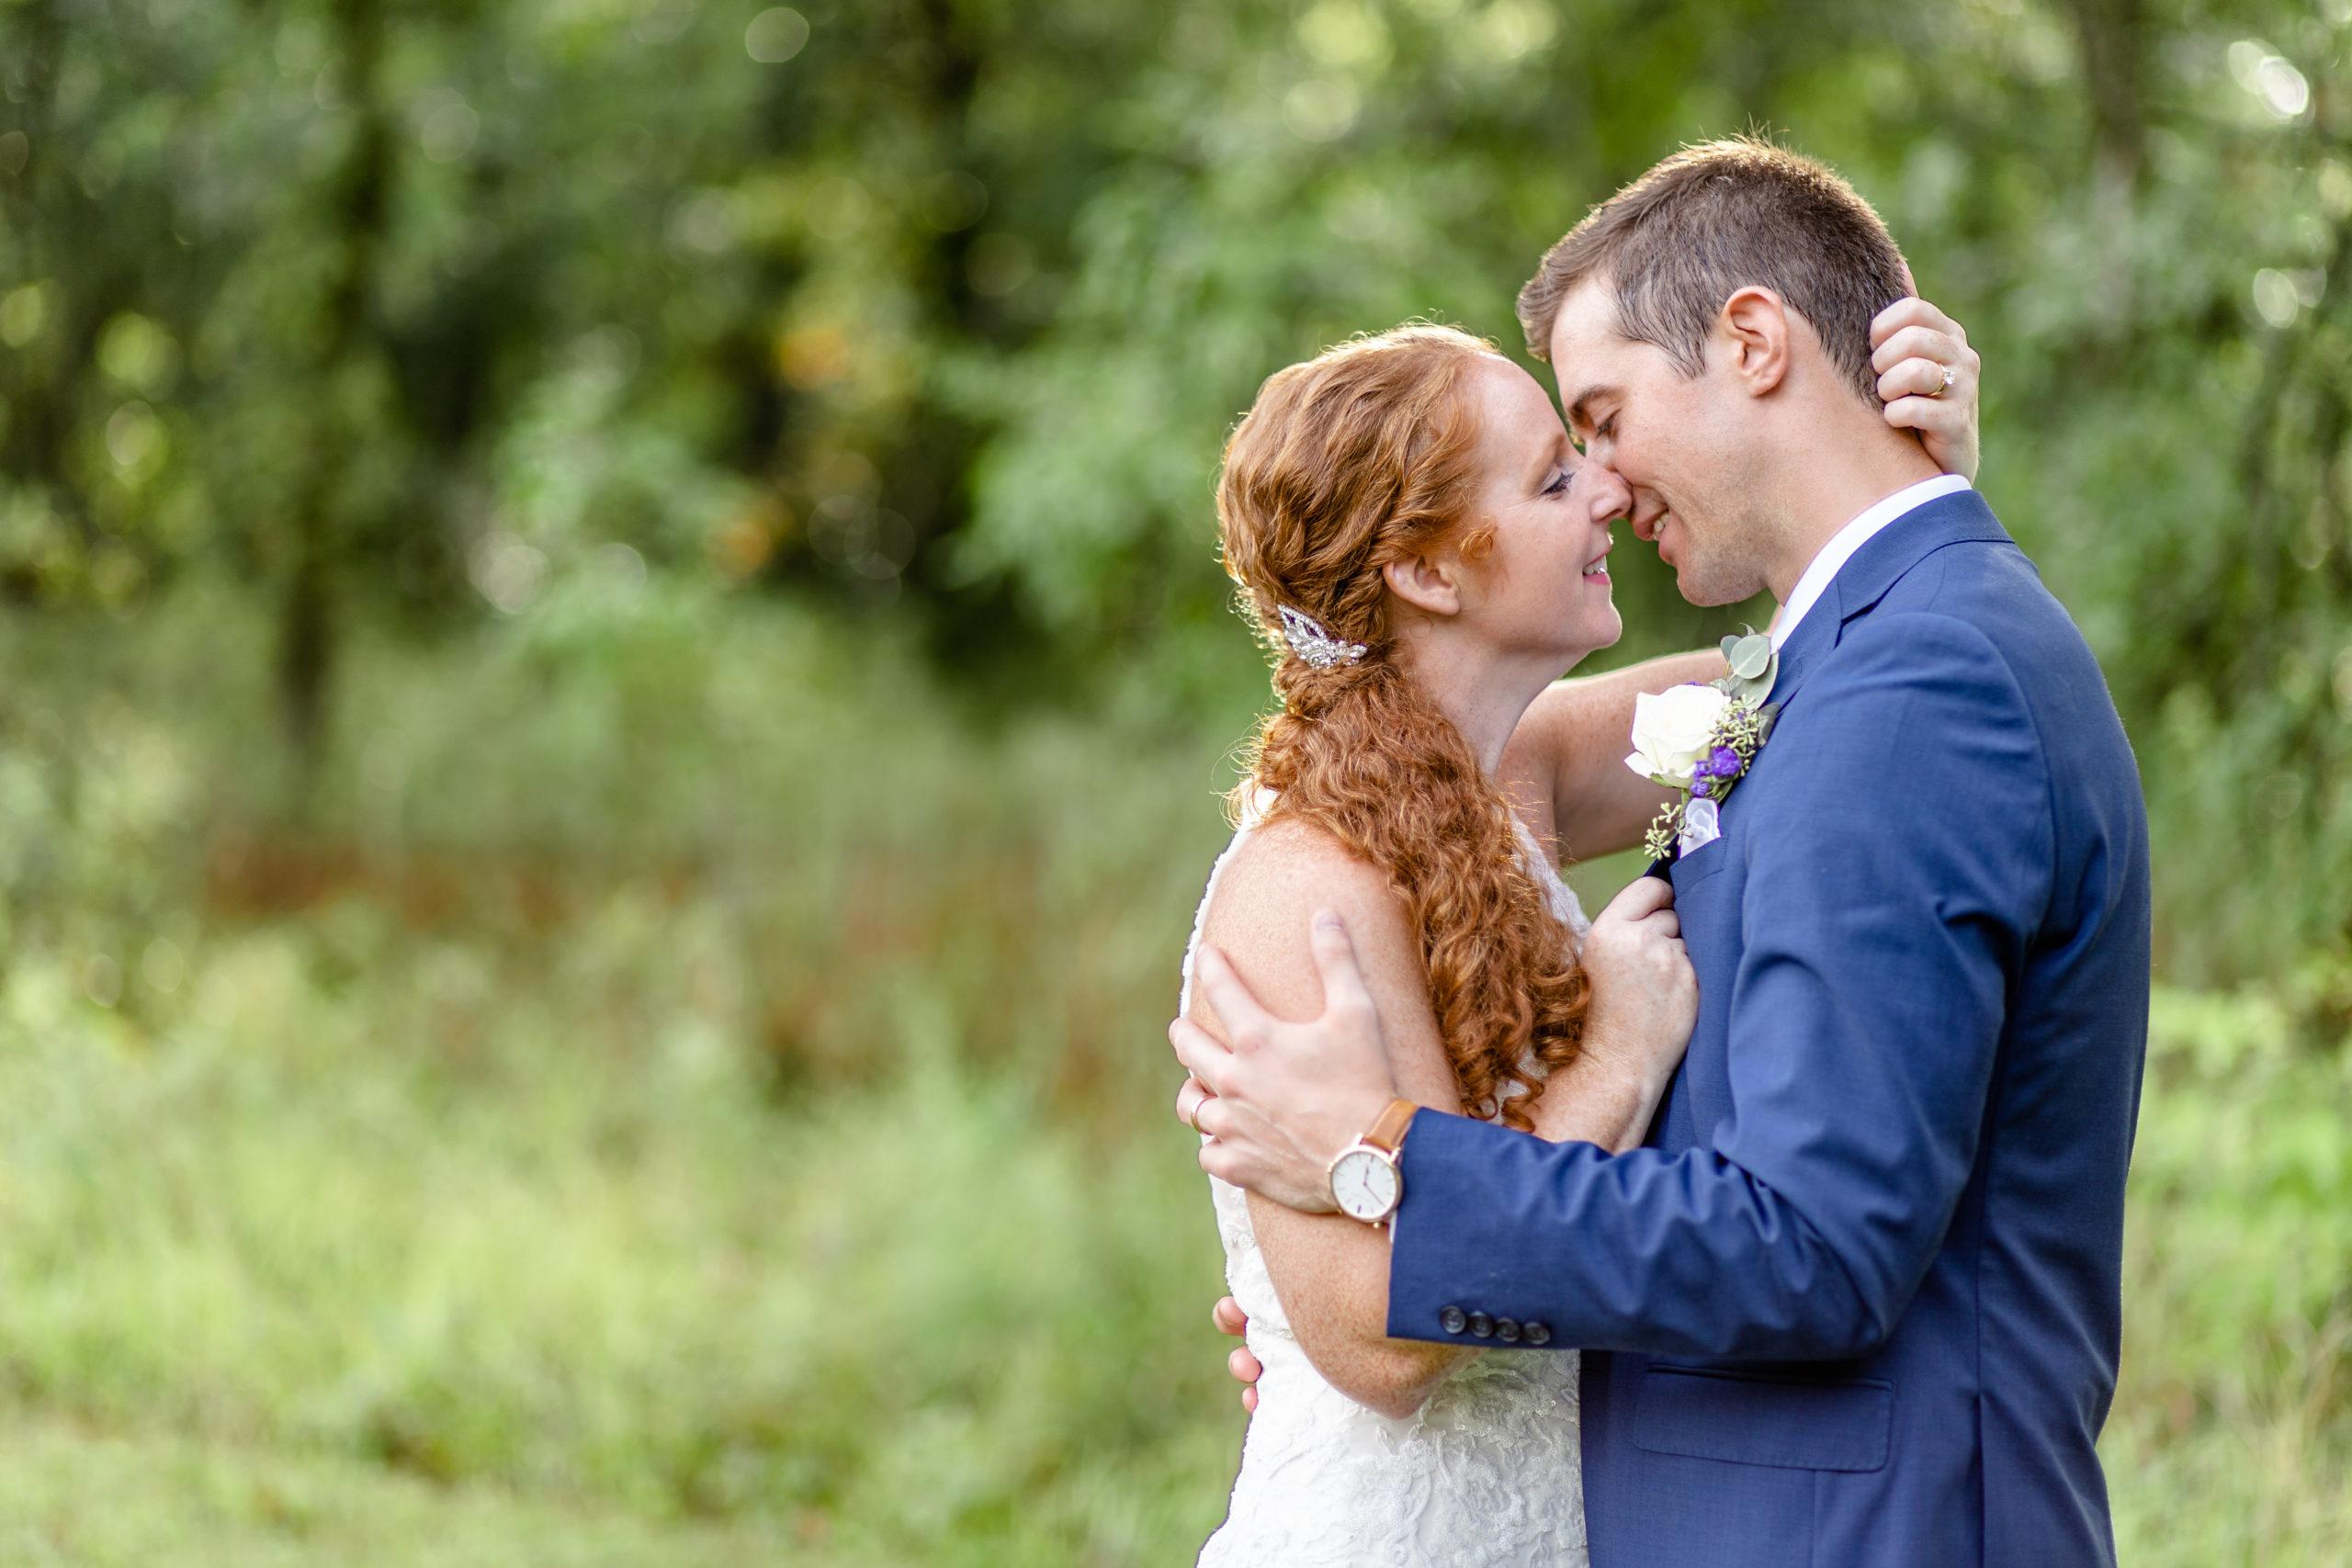 wedding photography, summer romance wedding, purple wedding accents, southern illinois wedding photography, bride and groom romantic kiss, lakeside wedding, woodland romance, woodland wedding